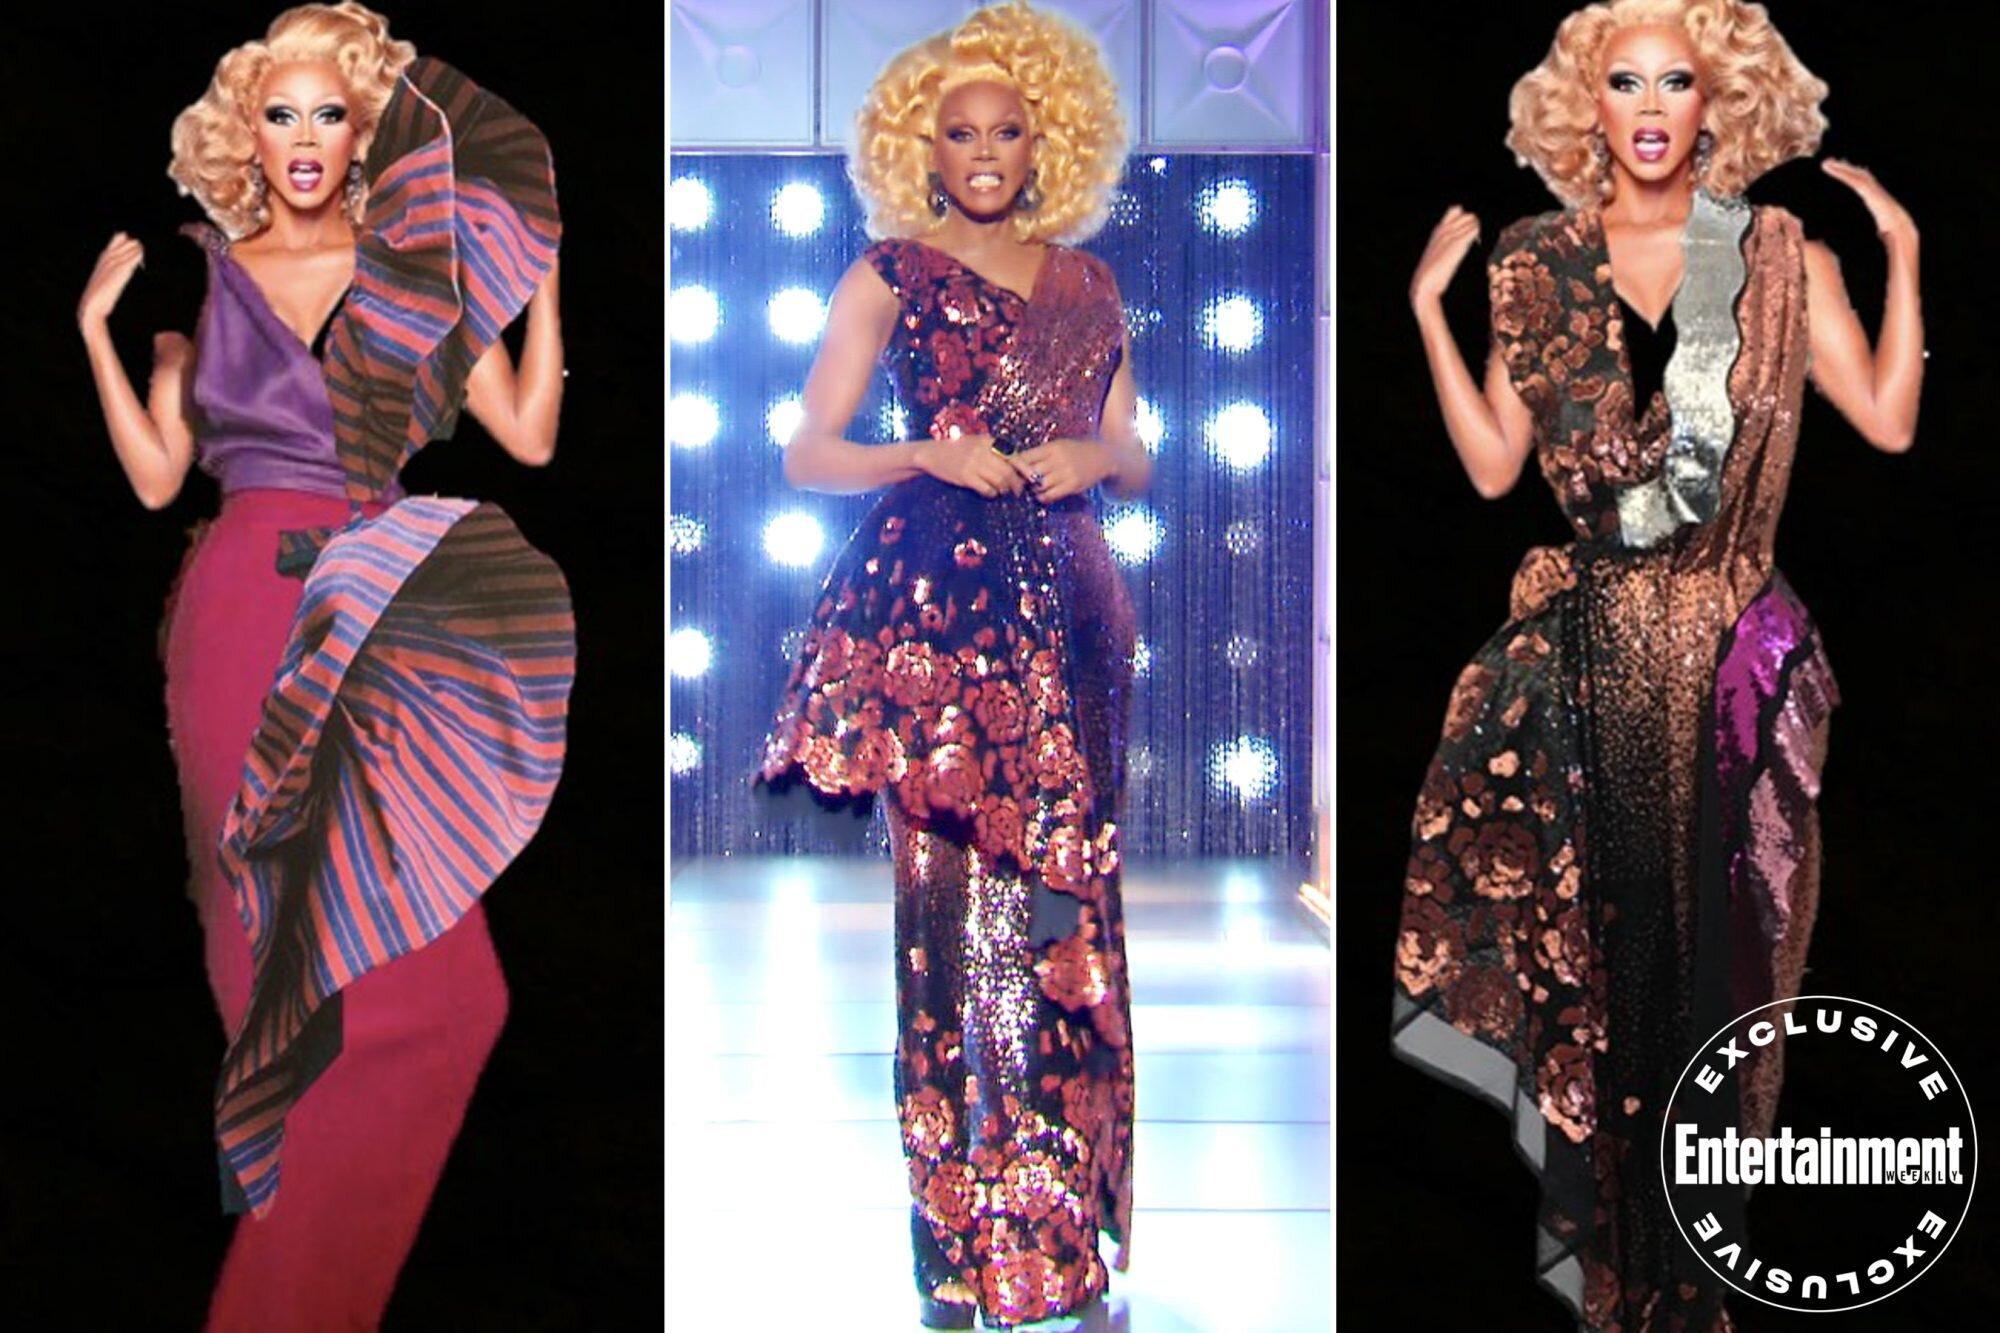 Rupaul S Drag Race Costume Design On Making Rupaul S Dresses Ew Com